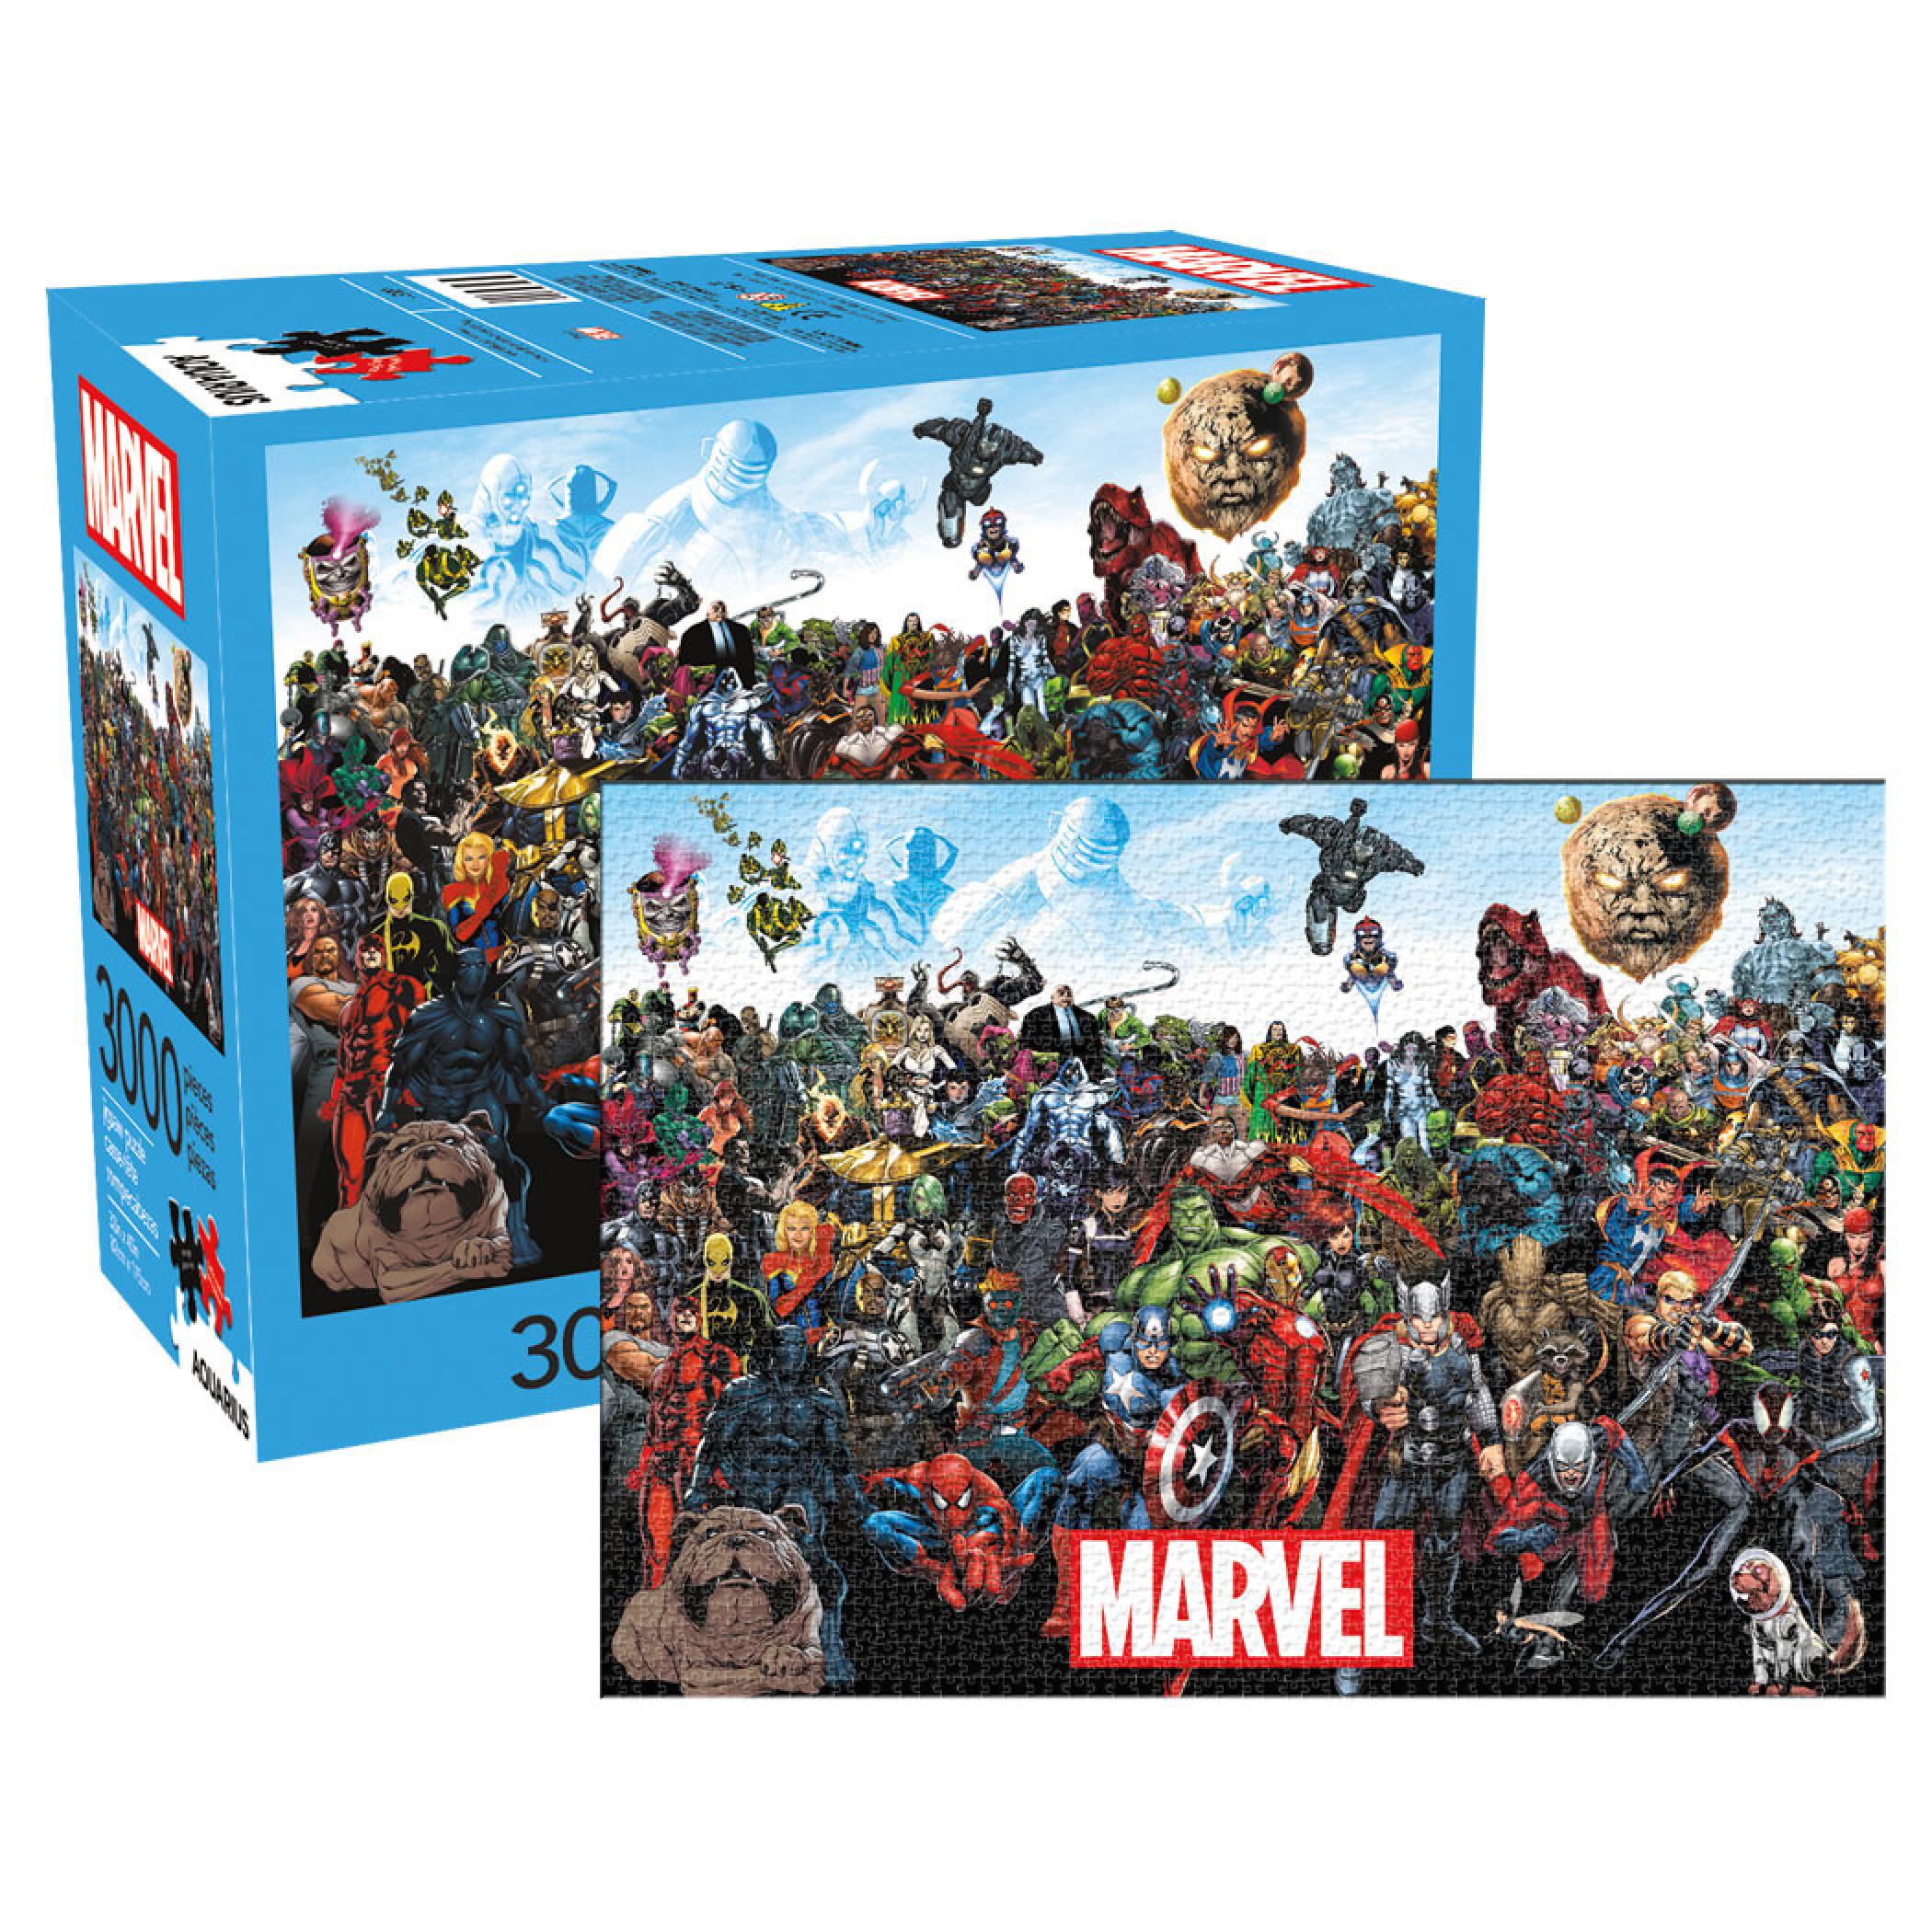 Marvel Cast Team Up 3,000 Piece Puzzle